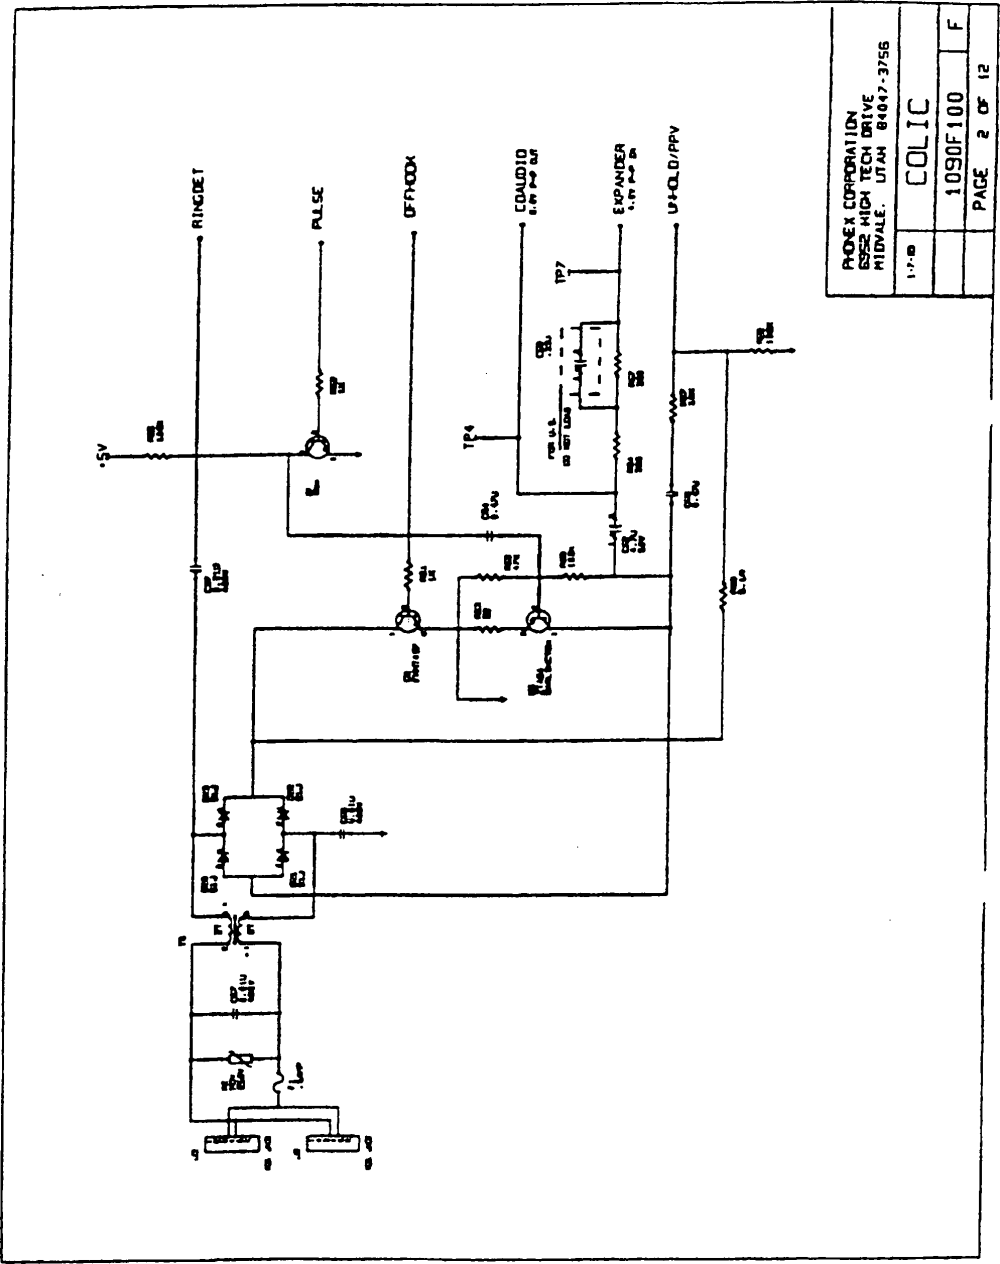 medium resolution of continuity tester circuit diagram tradeoficcom wiring diagram today electronic organ frequency divider circuit diagram tradeoficcom